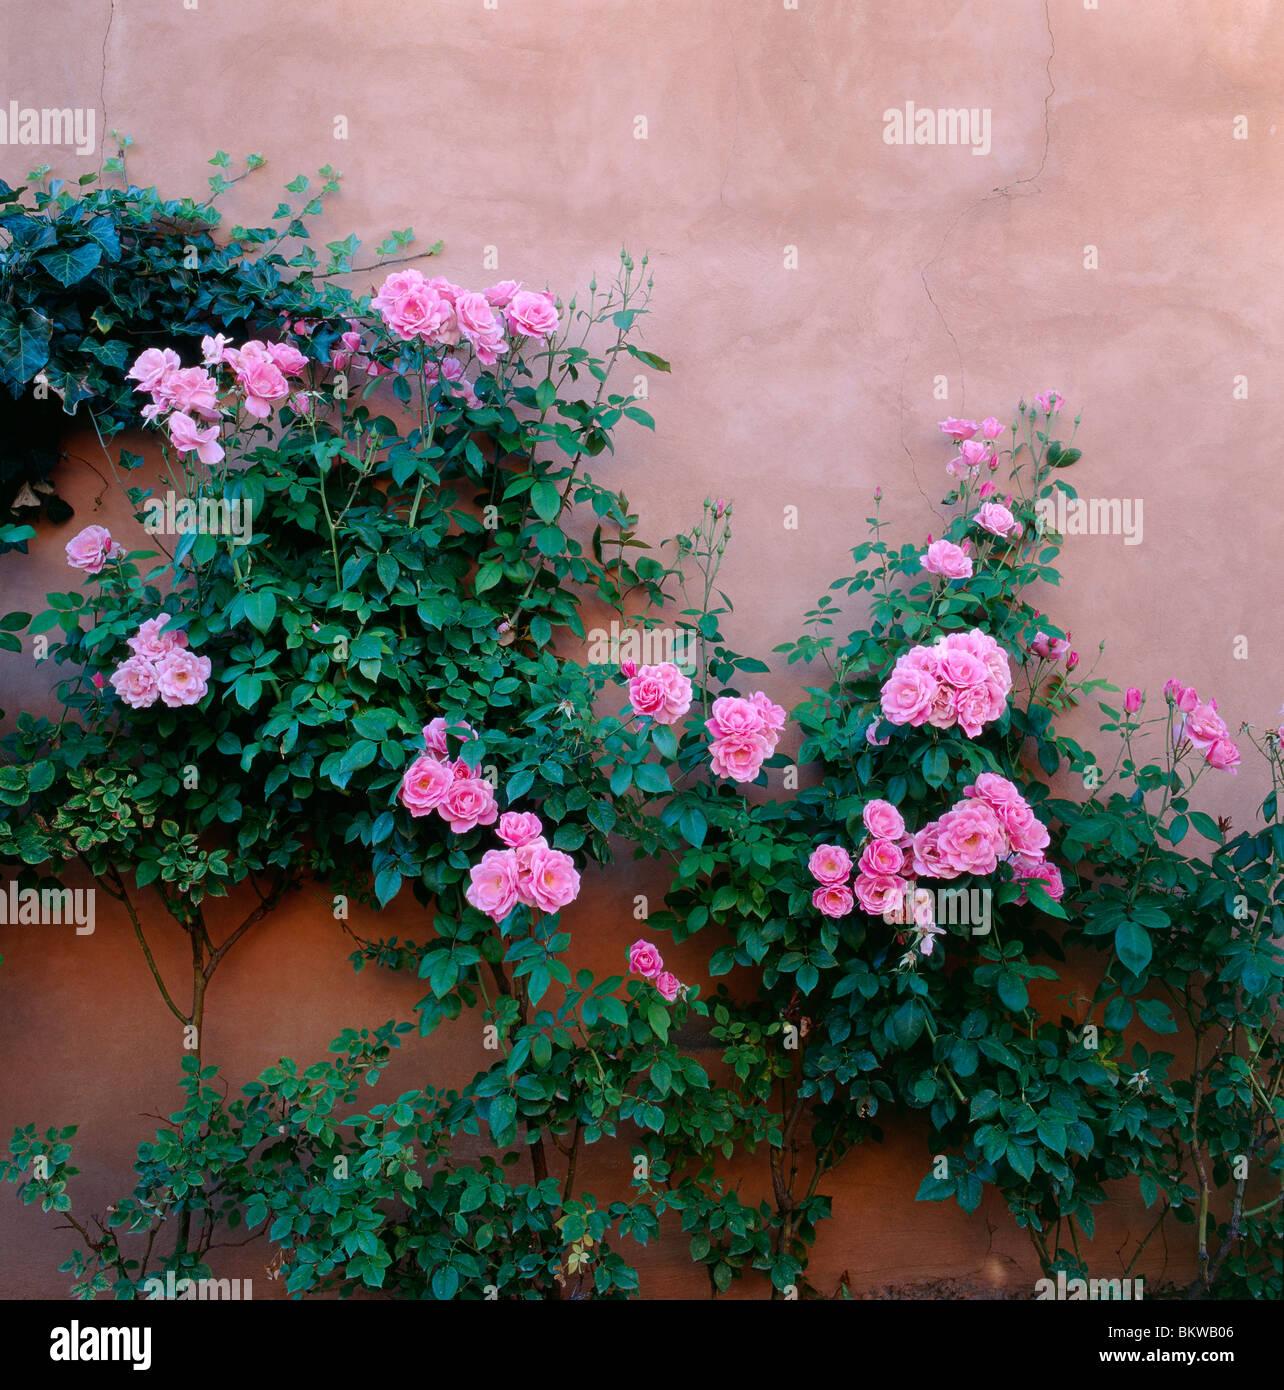 Rosa Rosen Klettern eine Adobe-Wand entlang Canyon Road, Website der Galerien & Geschäfte, Santa Fe, New Stockbild